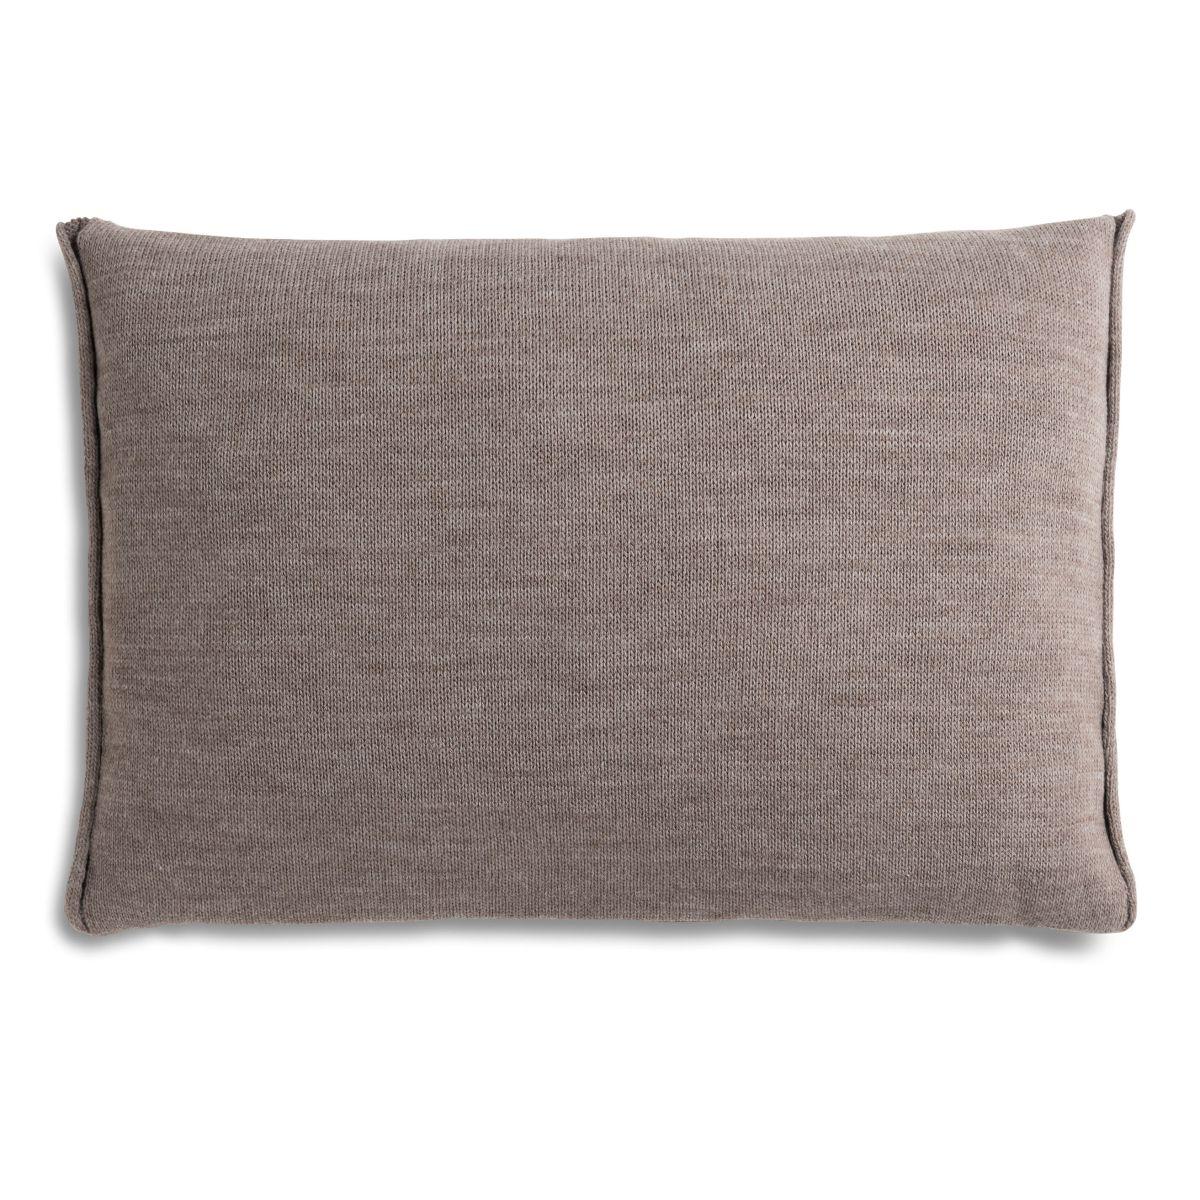 knit factory 1071329 kussen 60x40 noa taupe 2